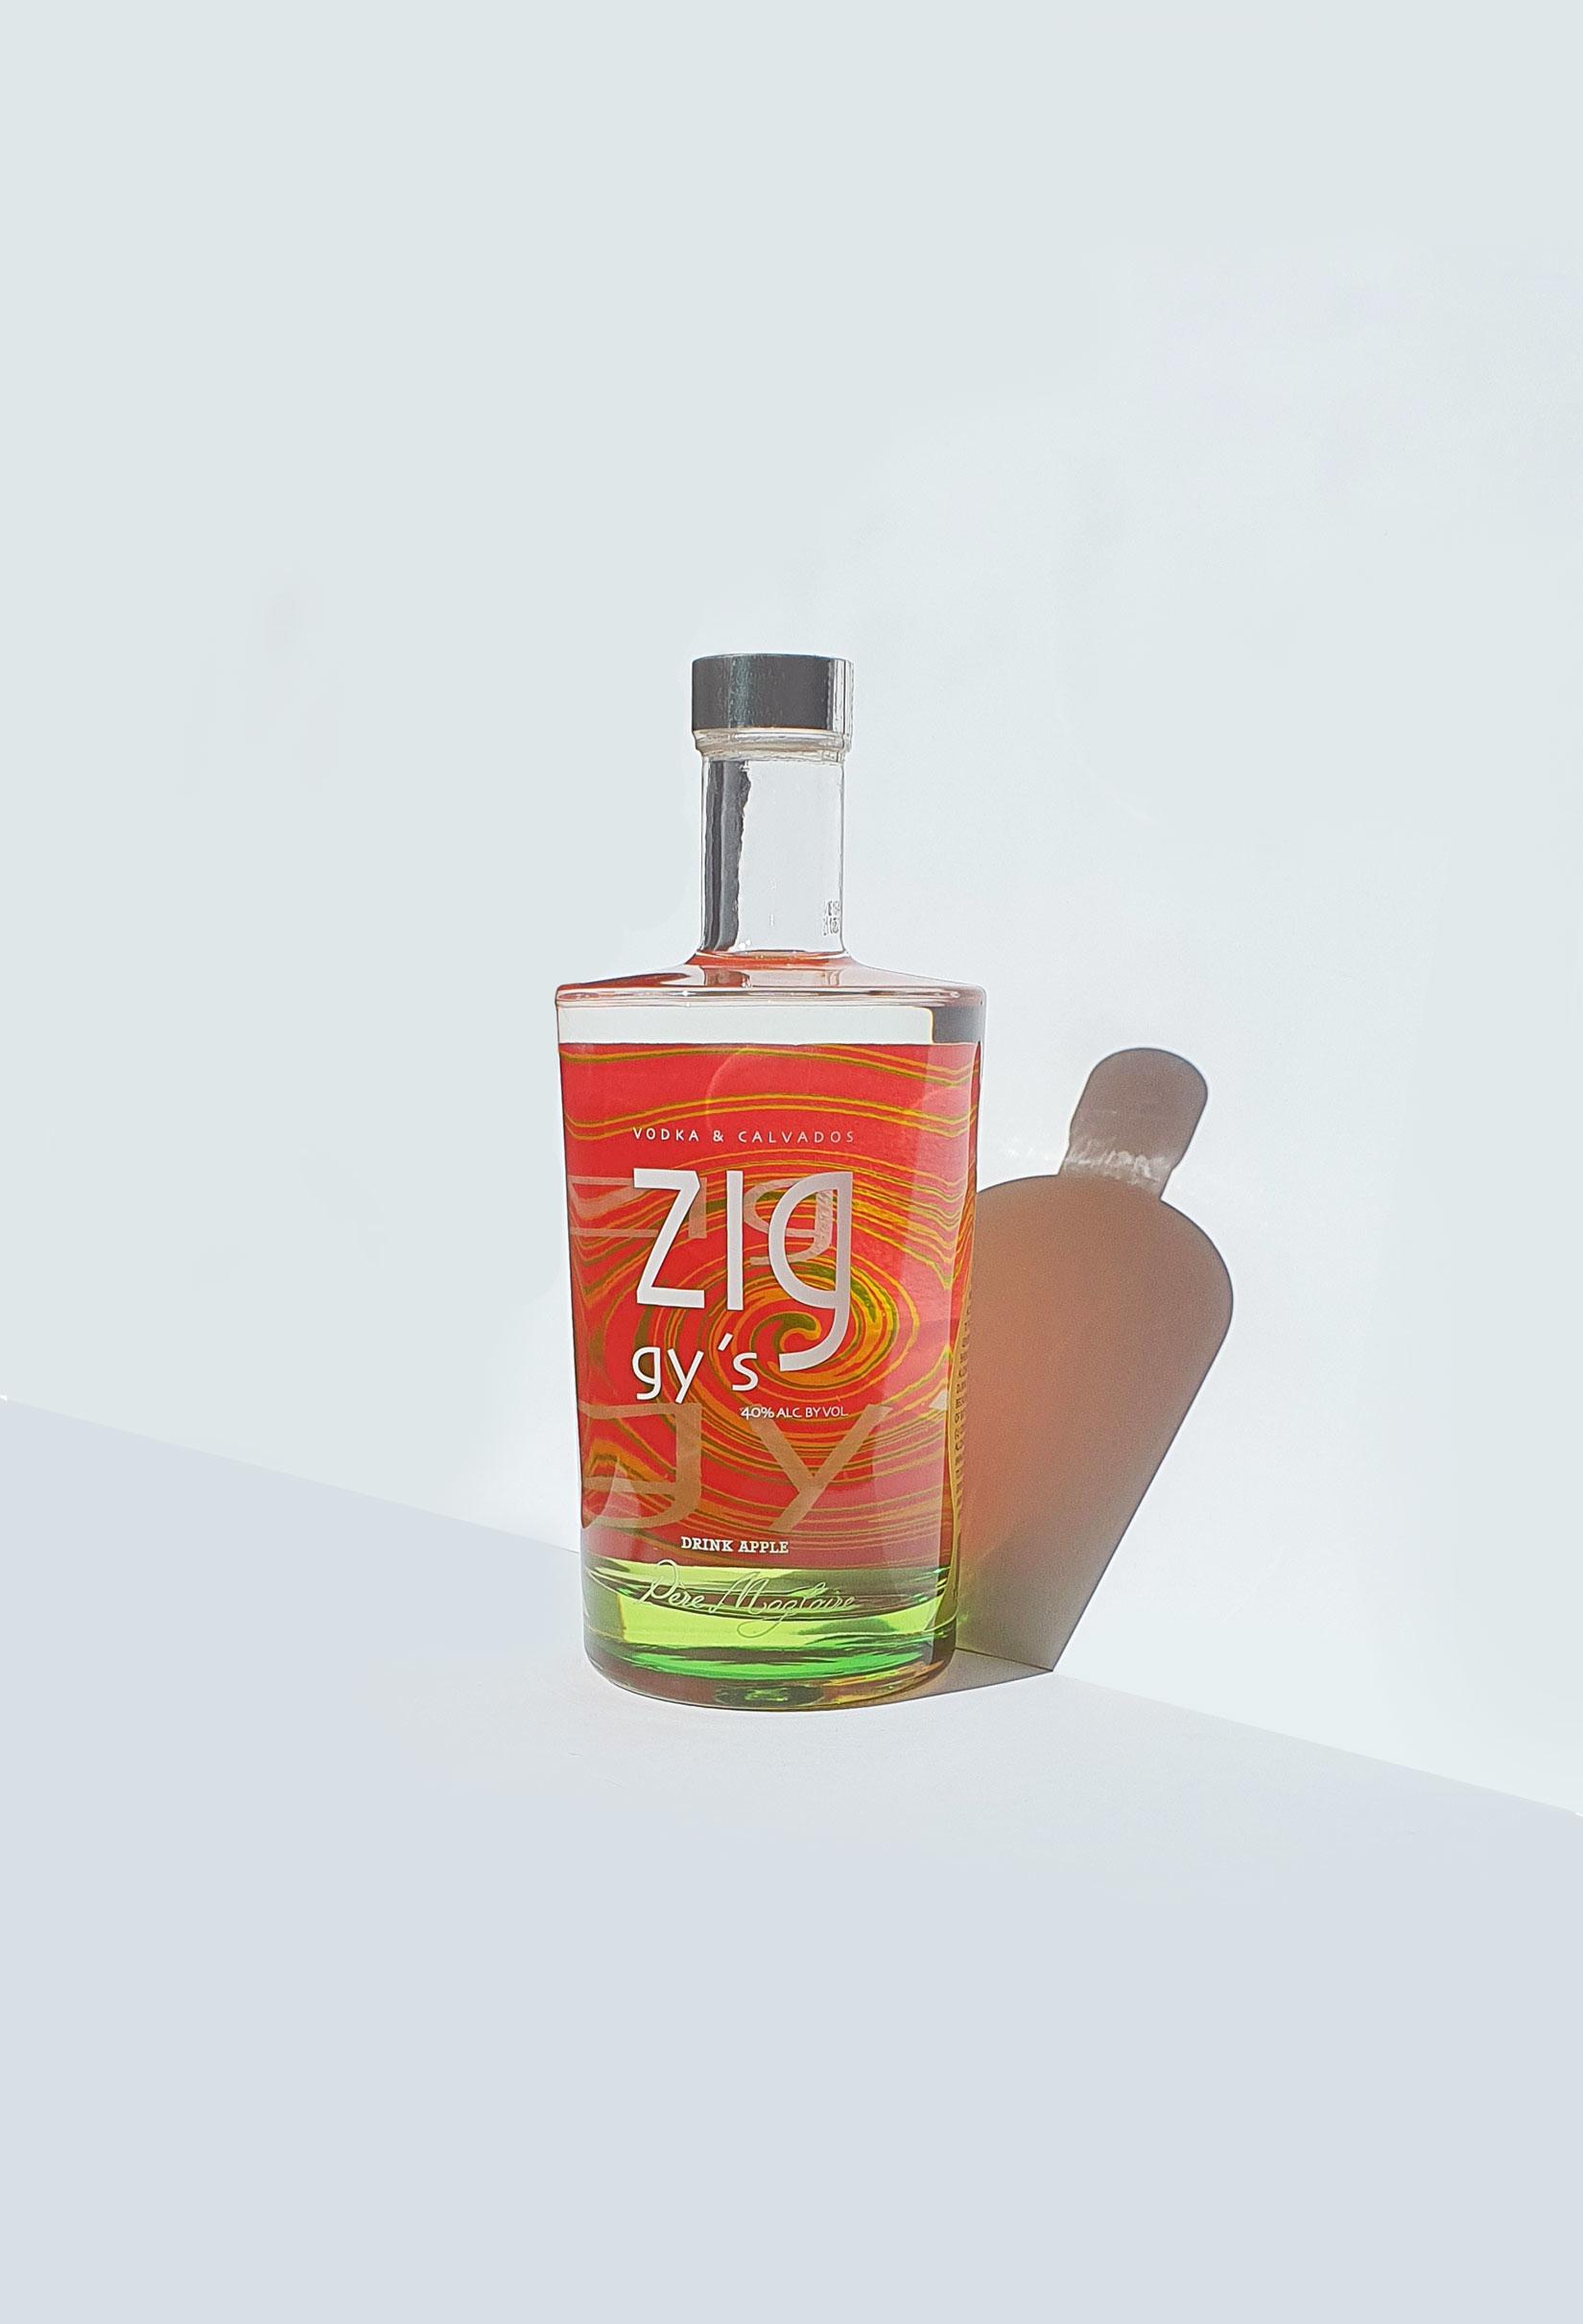 bouteille vodka calvados design A&P Sorigué